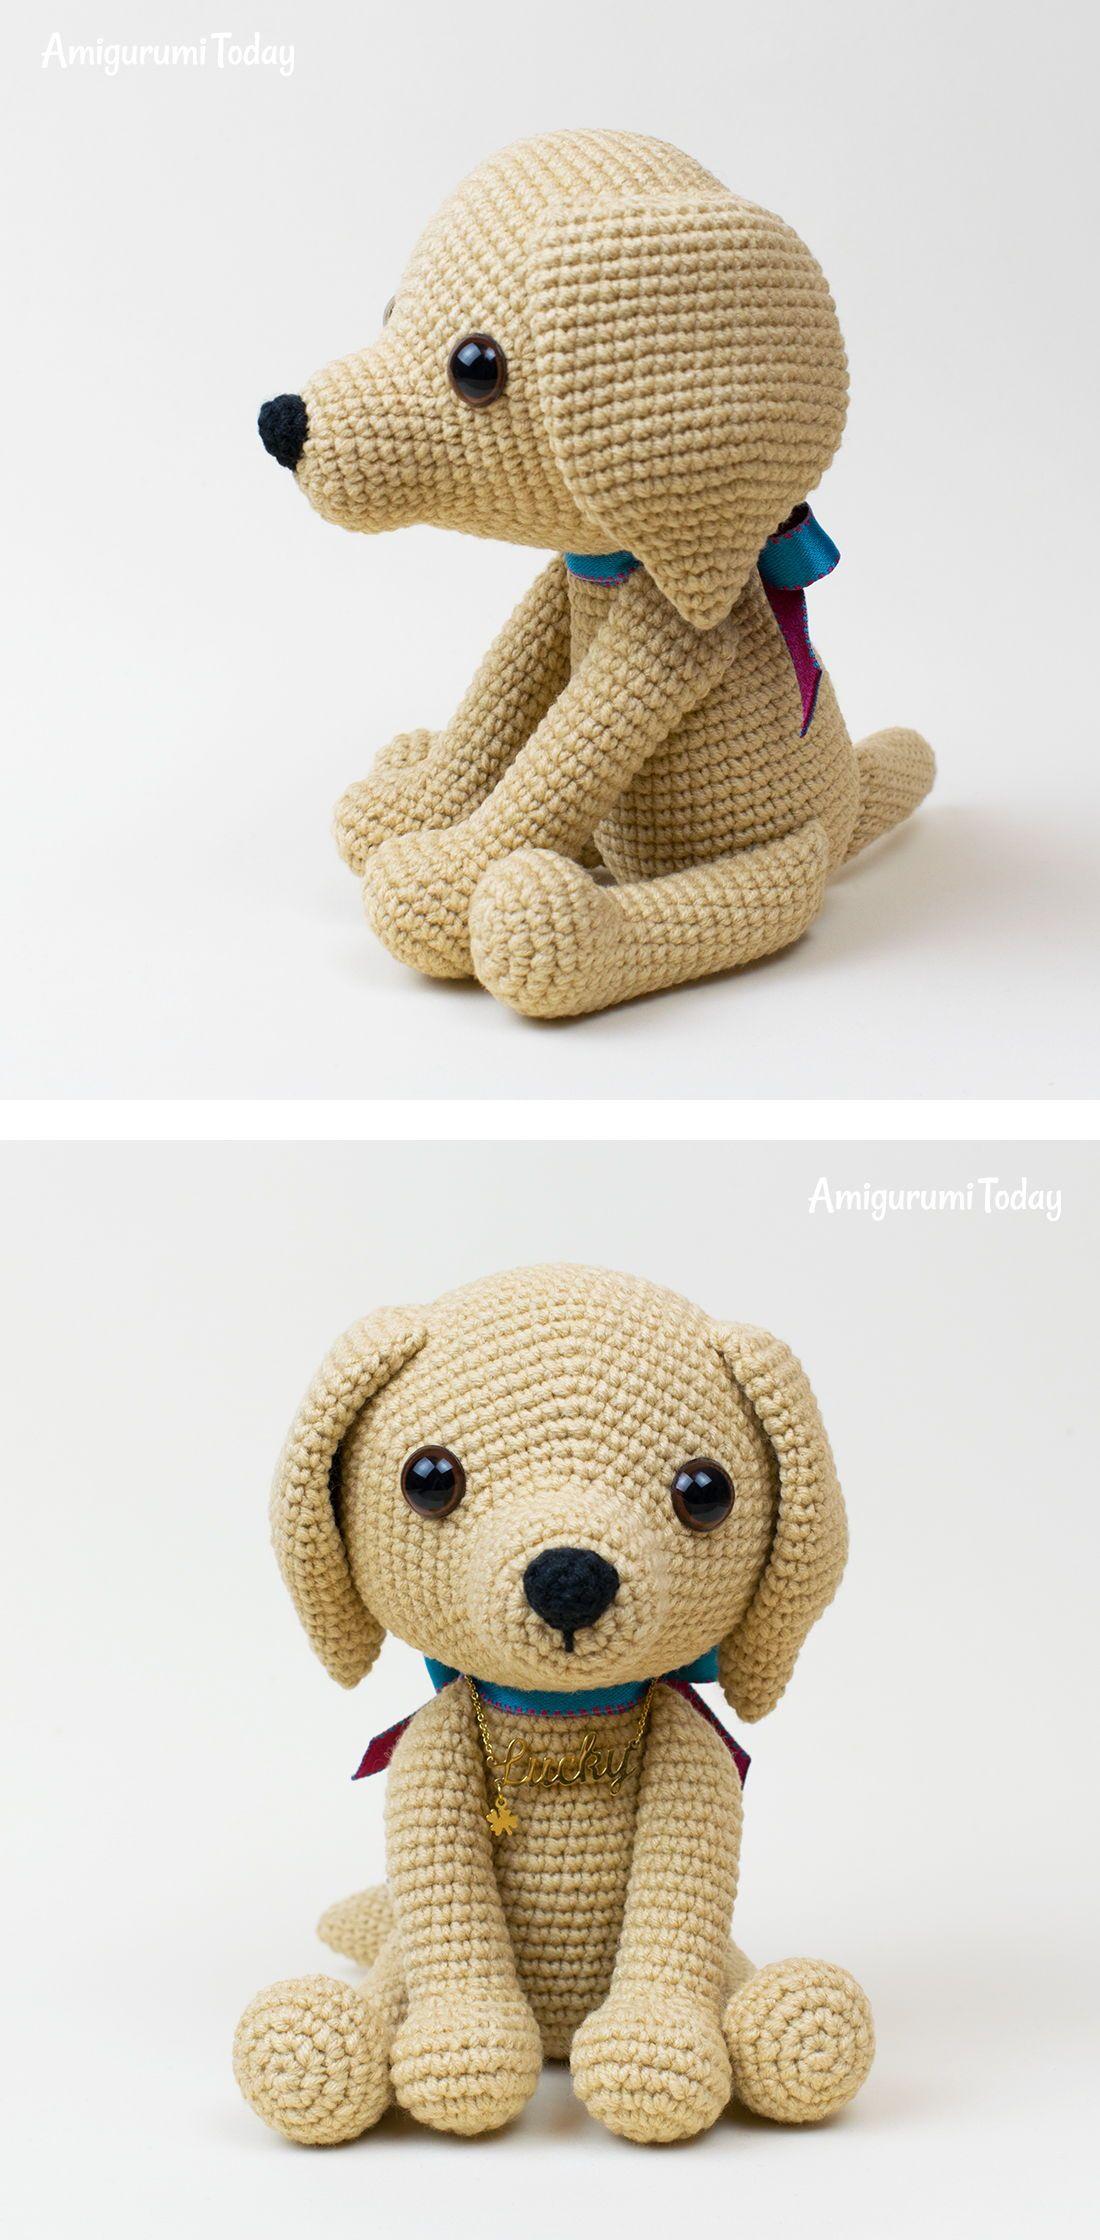 Lucky puppy amigurumi pattern   Cre8tion Crochet Community Board ...